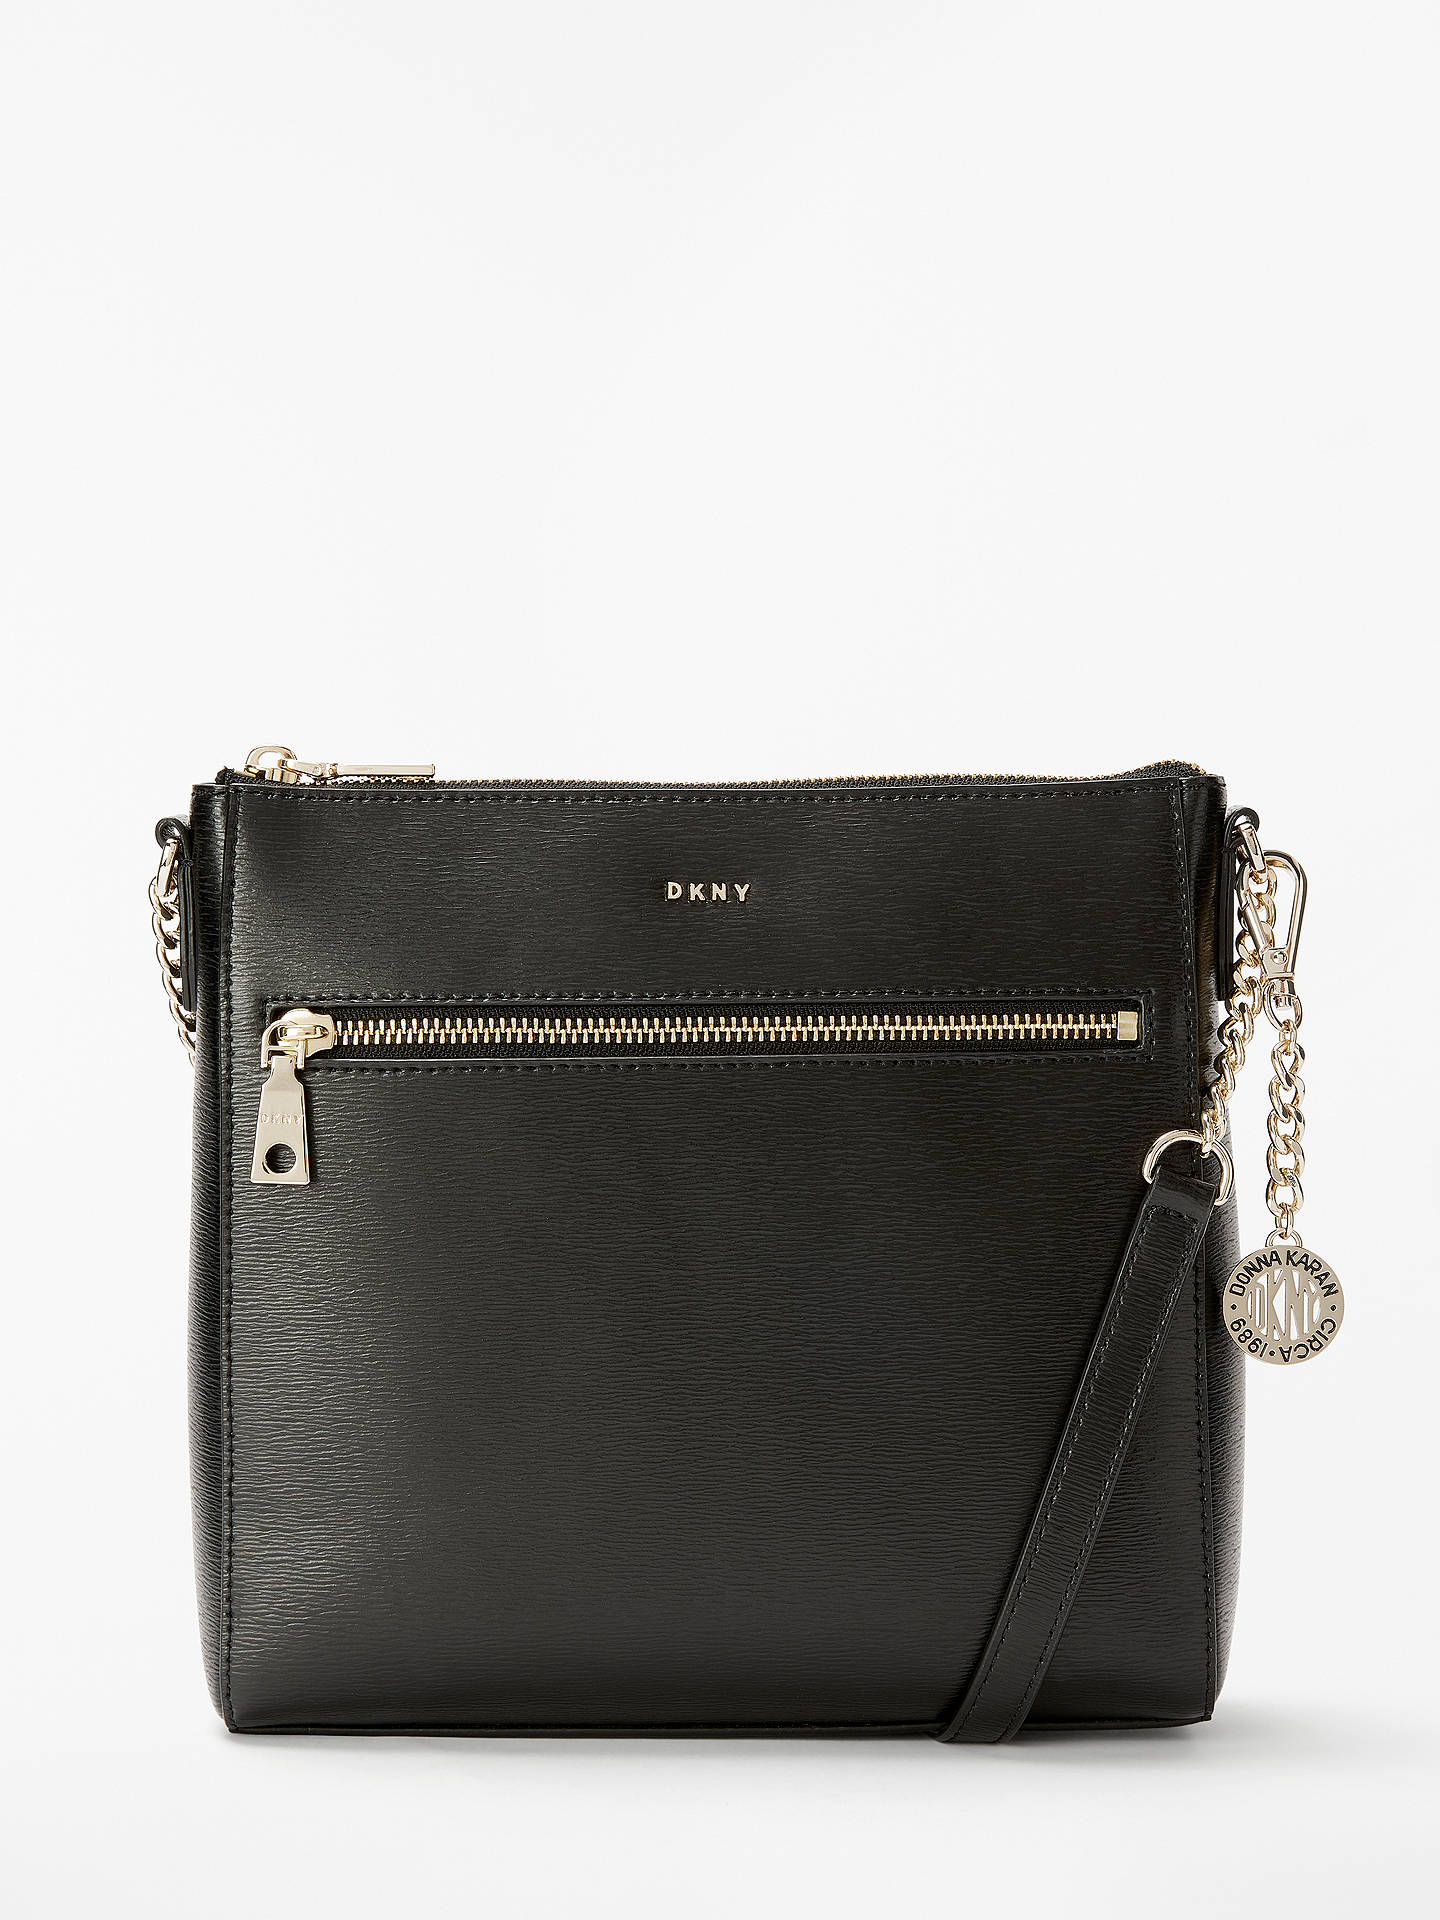 8bef759ba Buy DKNY Bryant Leather Large Zip Top Cross Body Bag, Black Online at  johnlewis.